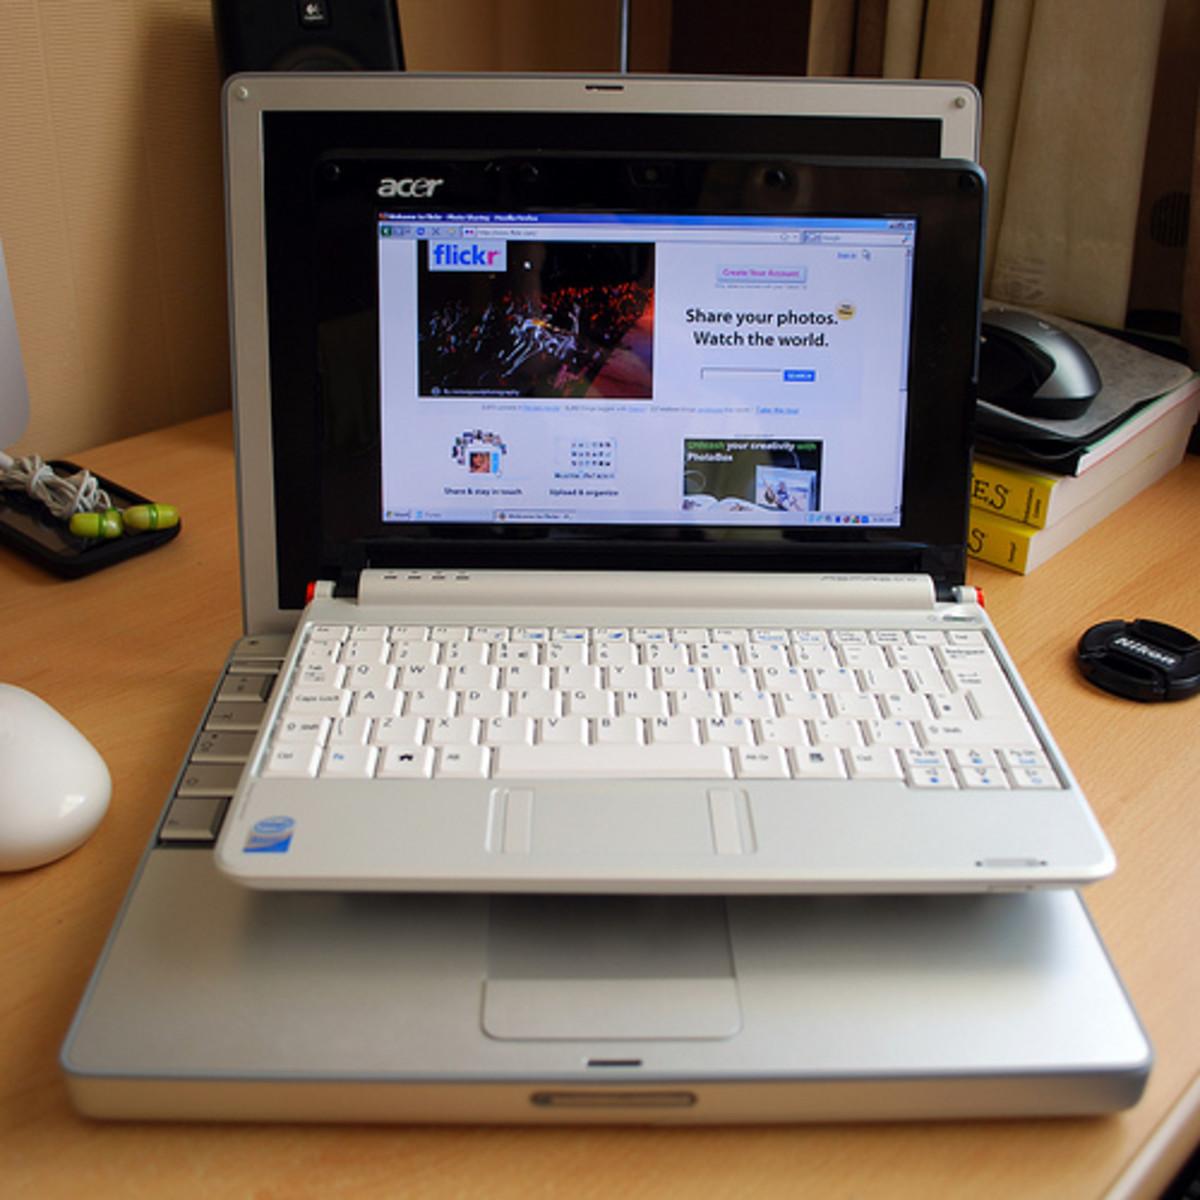 A Mini Laptop vs a Regular Laptop